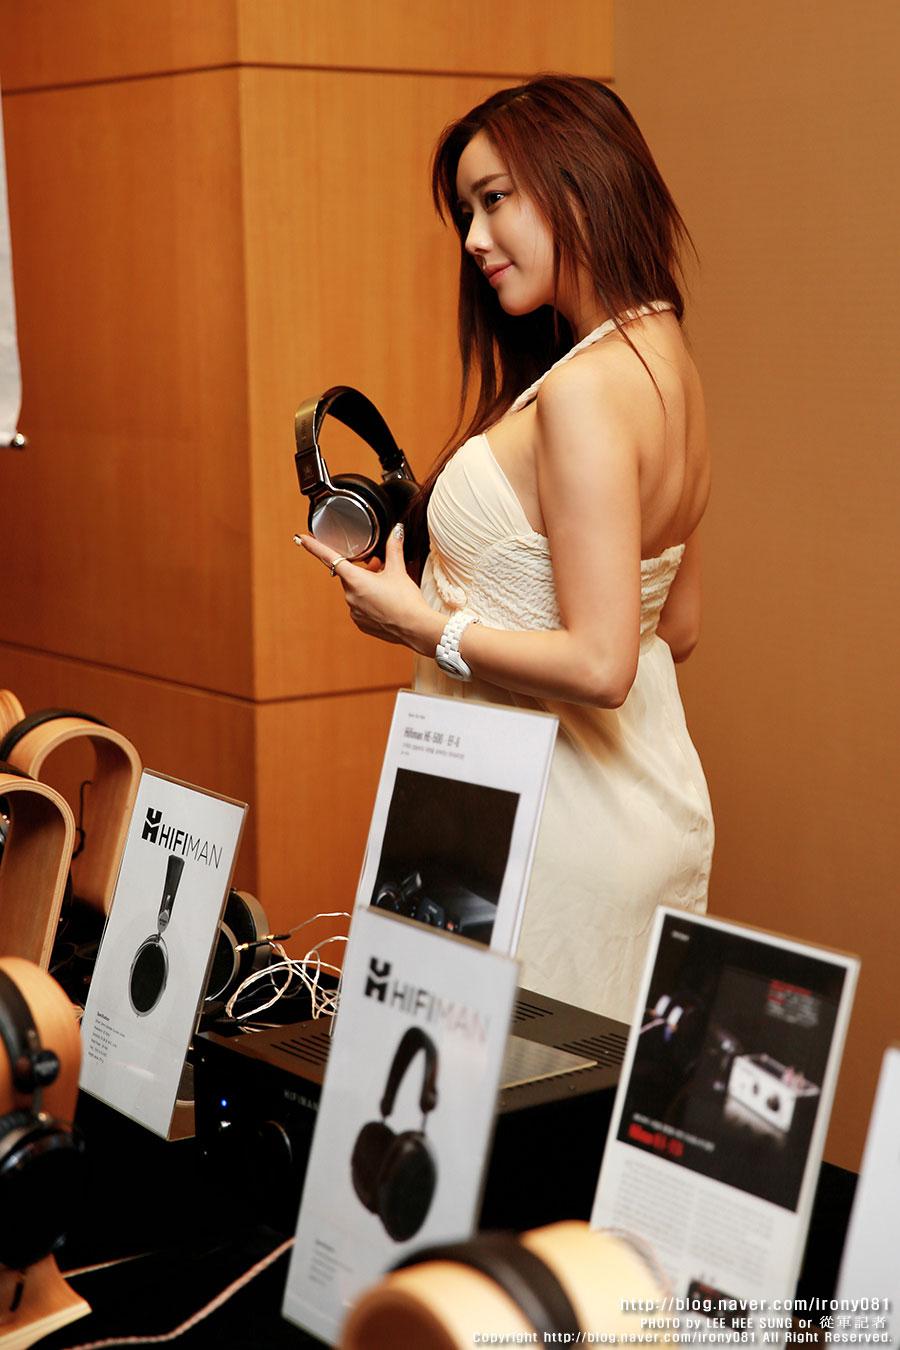 Kim Ha Yul MOFI Show 2014 Korea